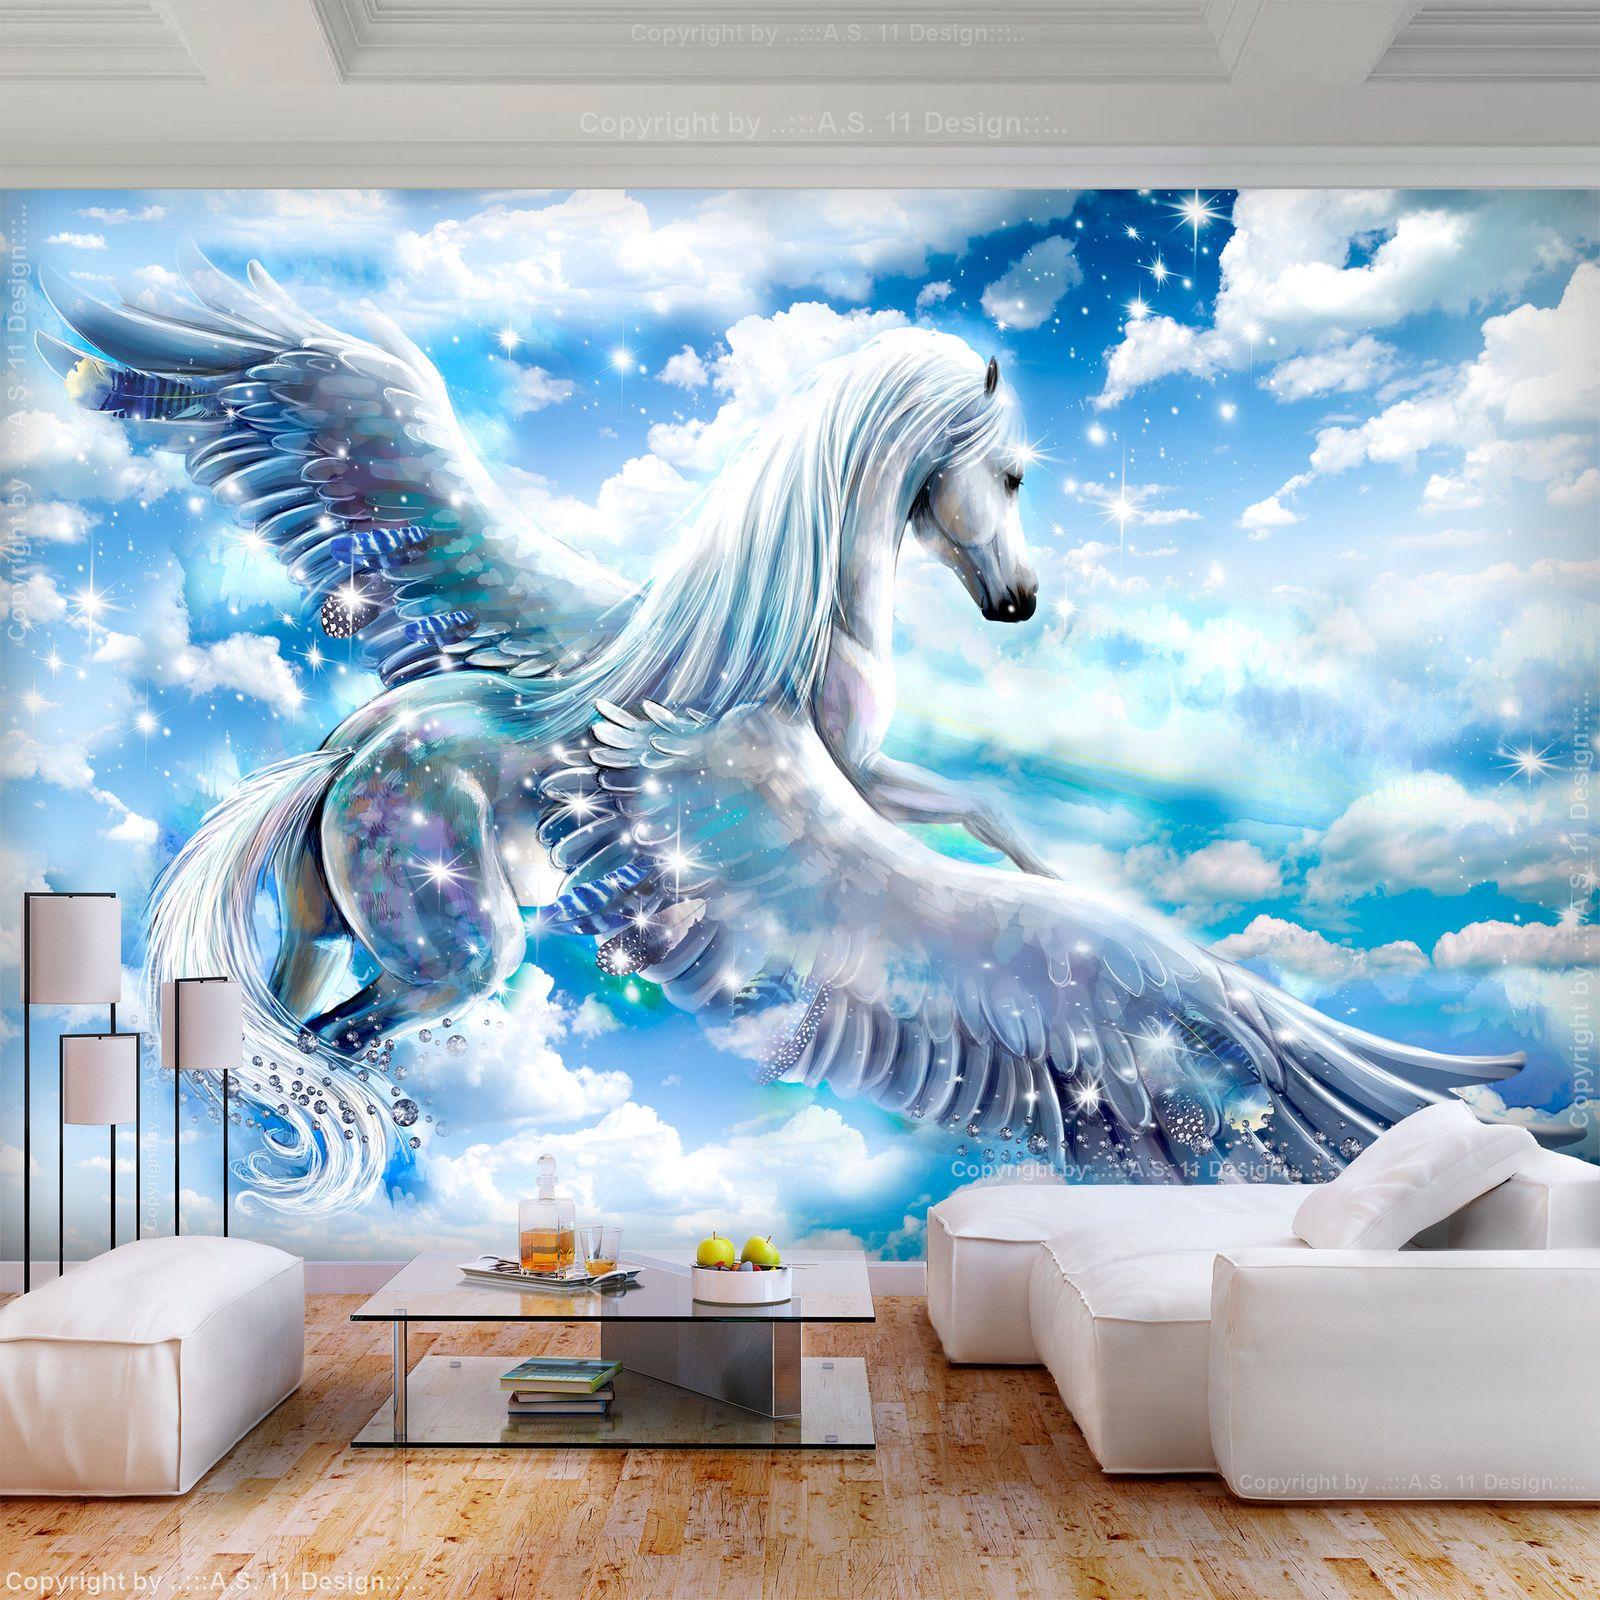 Vlies Fototapete Pferd Pegaz Blau Himmel Tapete Kinderzimmer